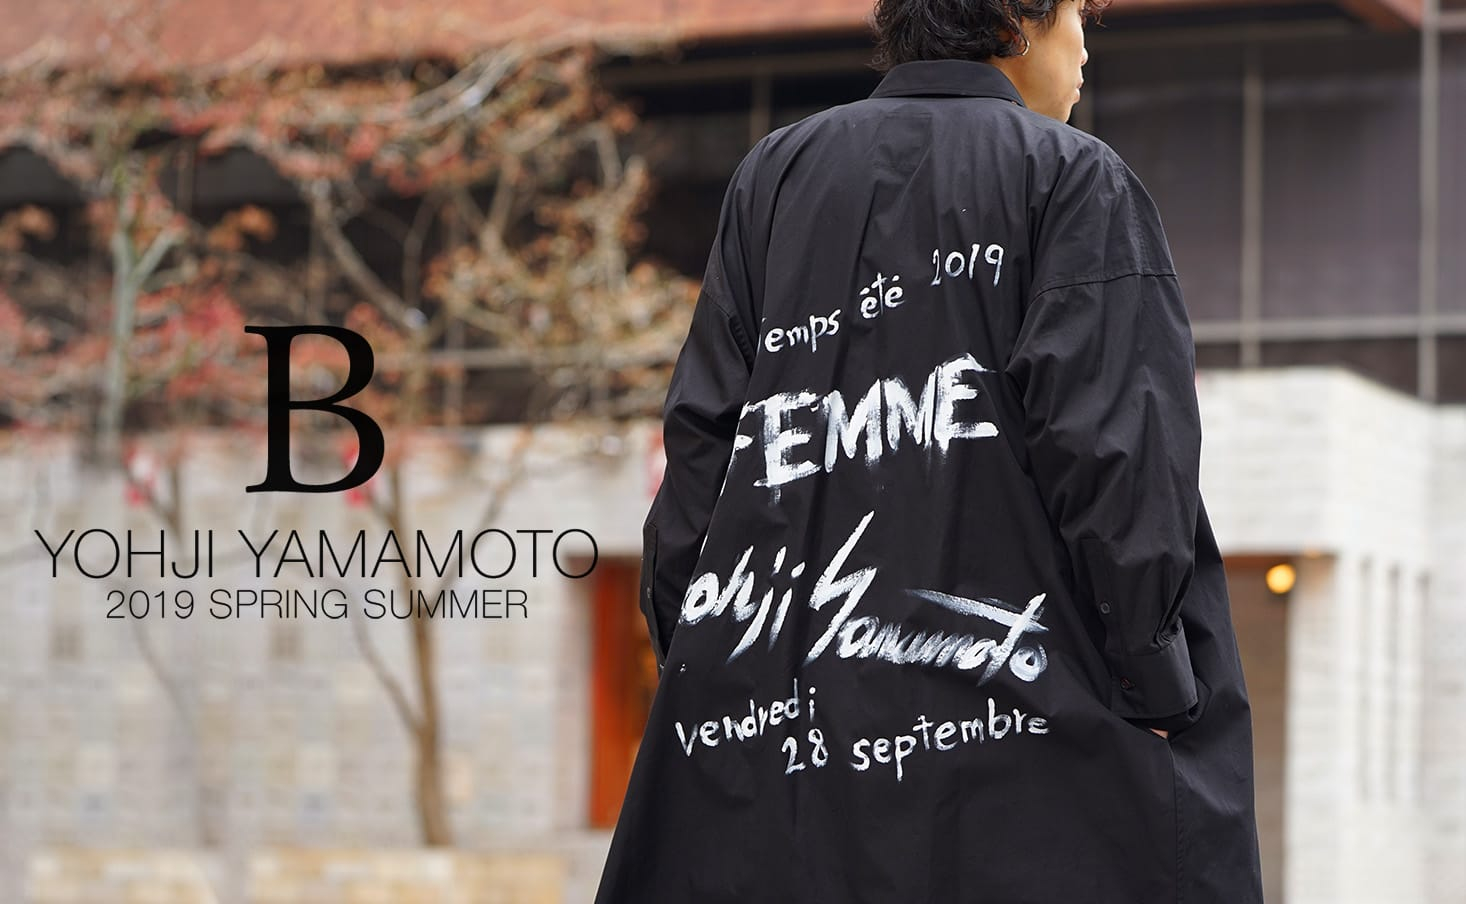 B Yohji Yamamoto(ビーヨウジヤマモト)2019SS(春夏) コレクション